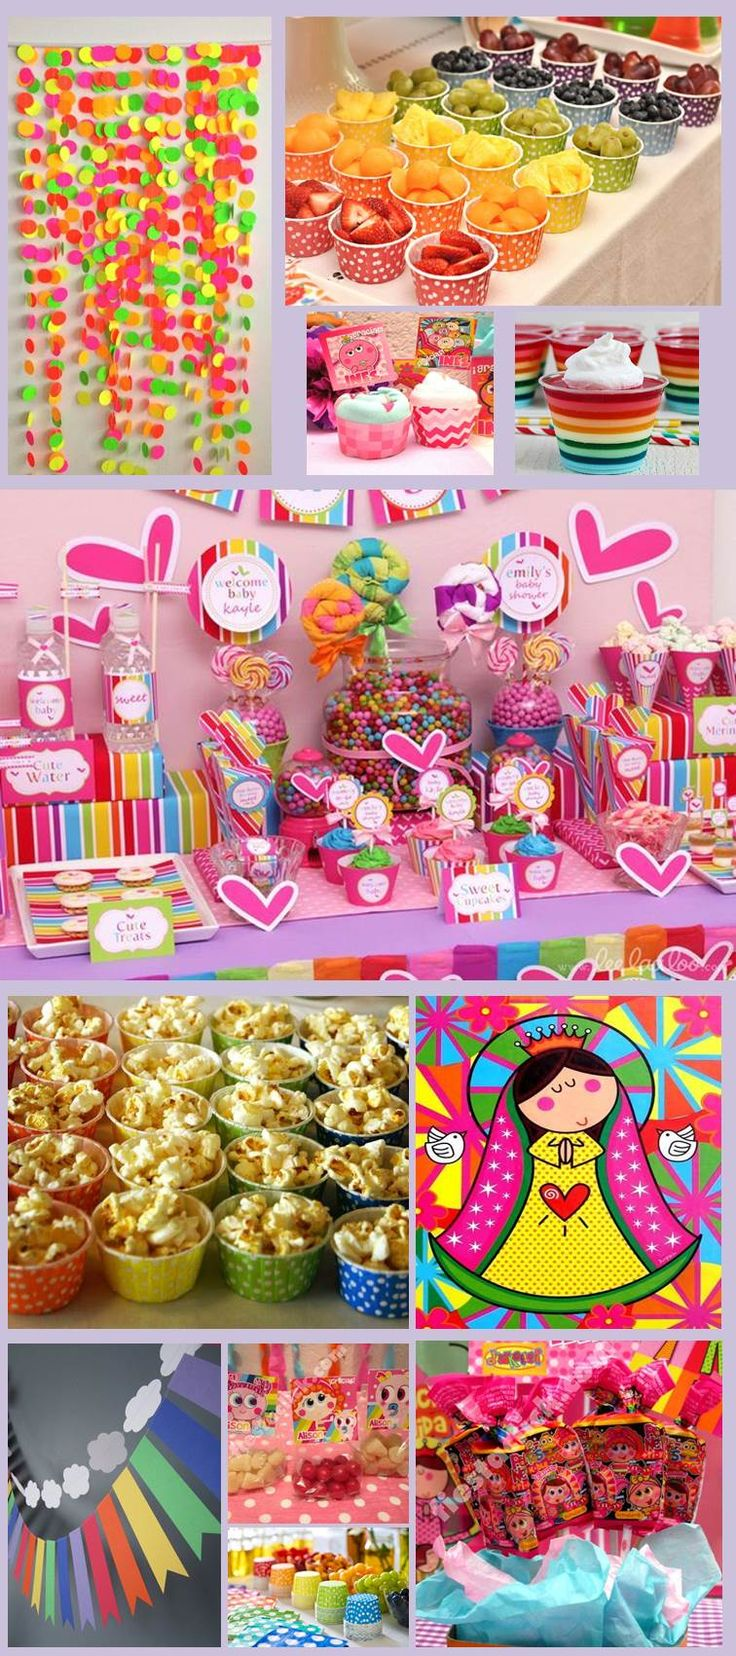 Candy Bar Distroller. Mesa de dulces y botanas. Virgencita Plis.